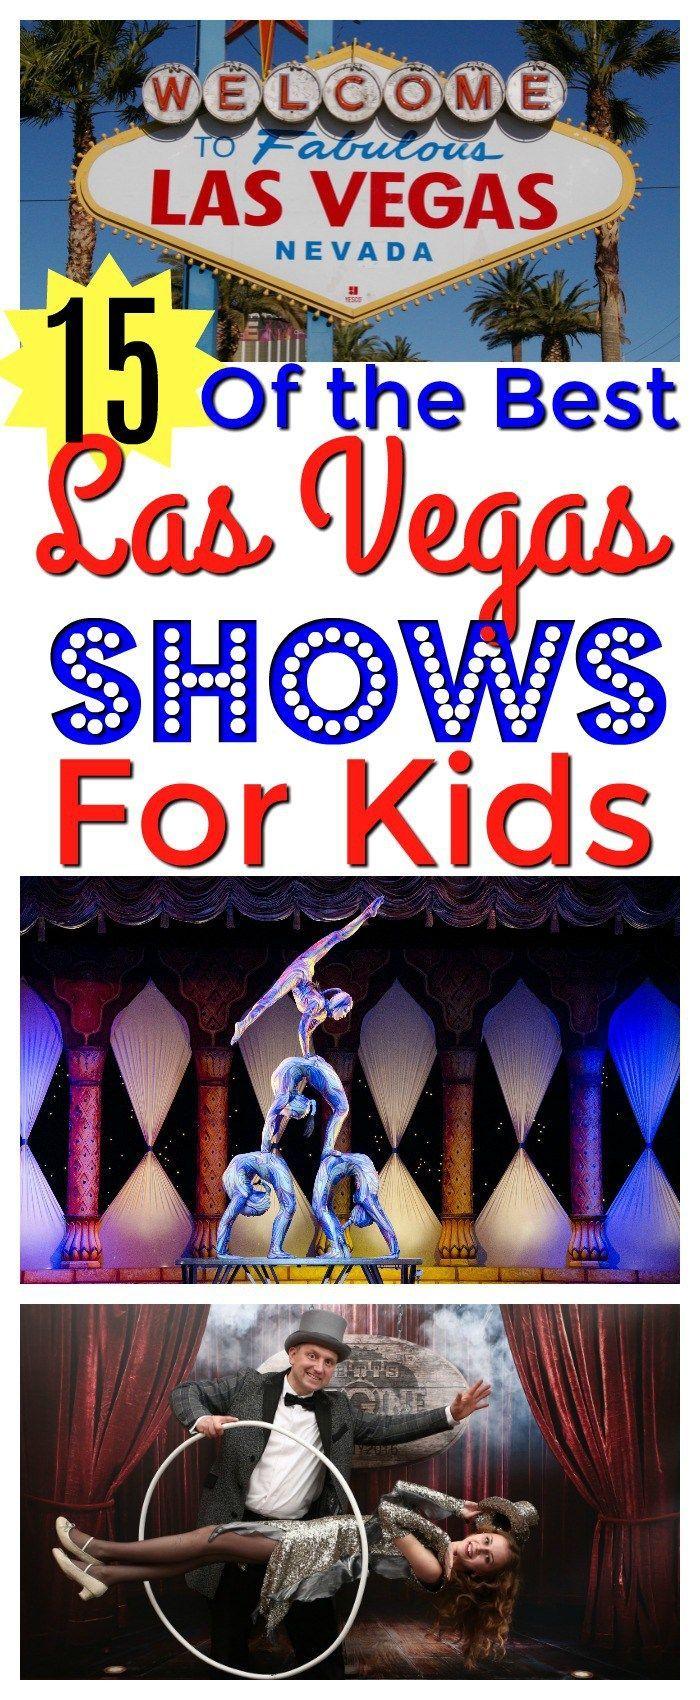 15 Of The BEST Las Vegas Shows